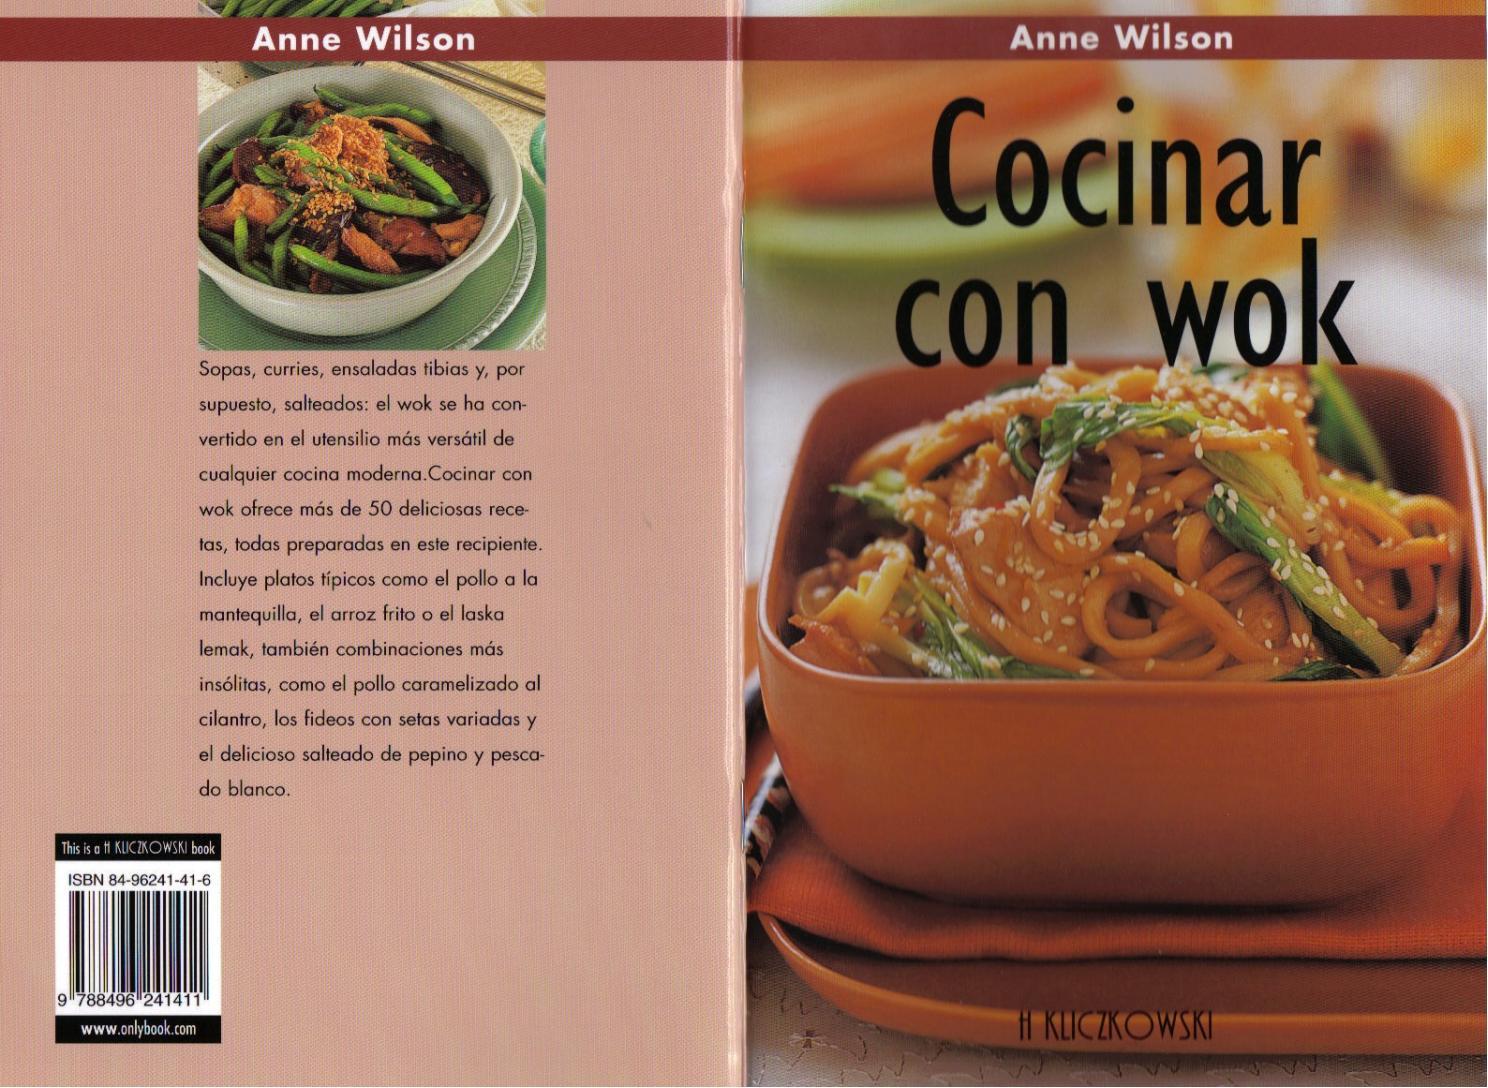 Cocinar con wok by anne wilson by manoel de oliveira issuu for Cocinar con wok